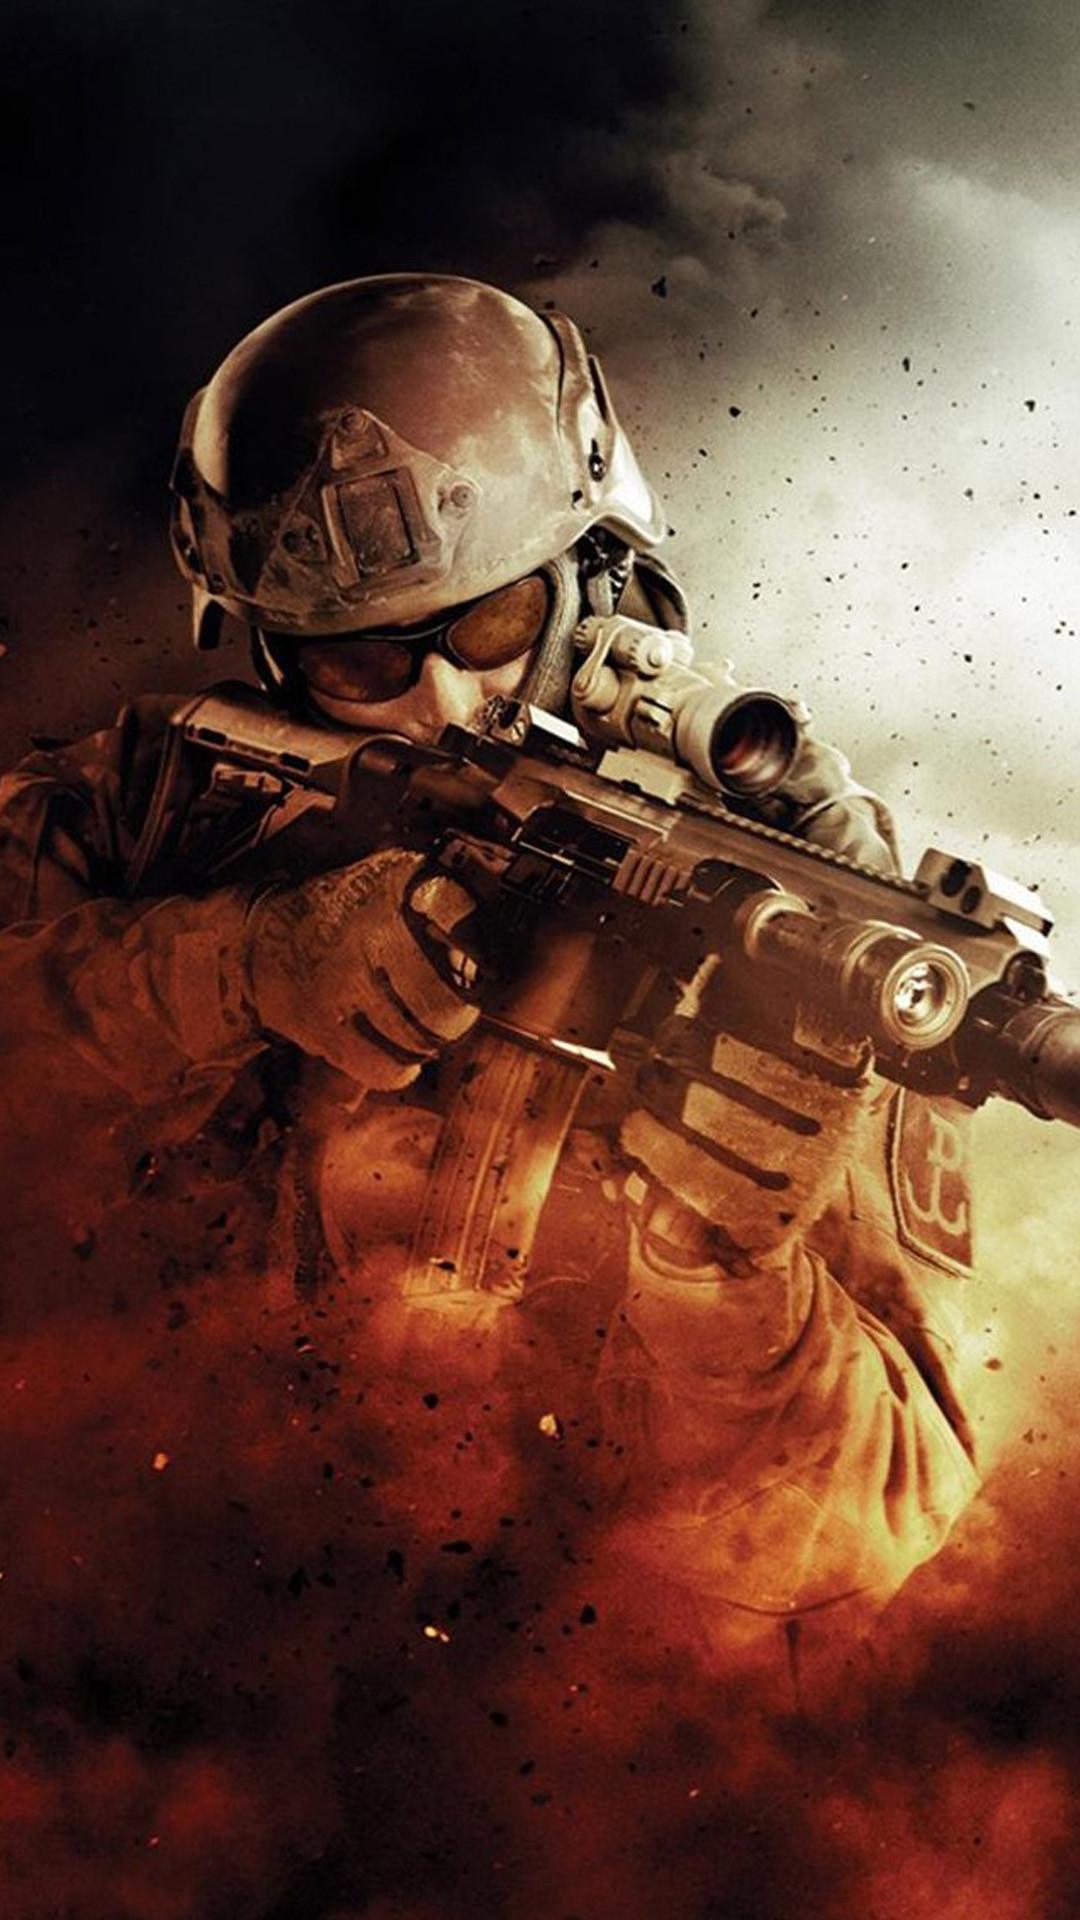 Res: 1080x1920, War Fire Fight Soldier Gun Weapon #iPhone #6 #plus #wallpaper